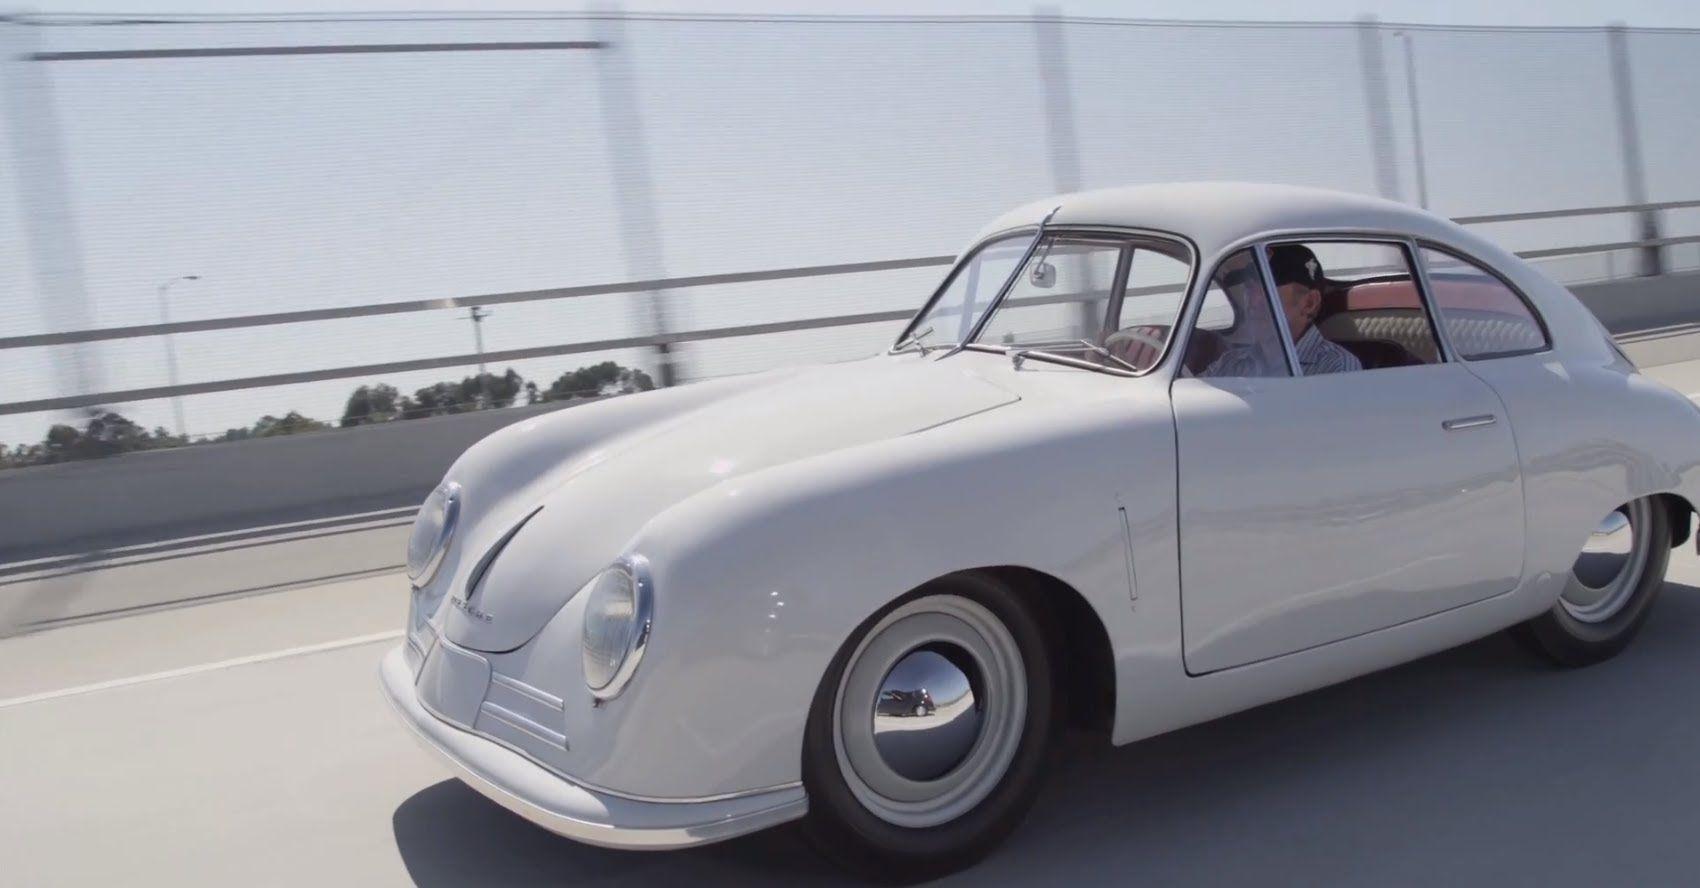 1949 Porsche 356 Gmünd Coupe Photo Shoot   1949 Porsche Gmünd Coupe Photo Shoot Video: The video below is a photo shoot of the legendary and icon... http://www.ruelspot.com/porsche/1949-porsche-356-gmund-coupe-photo-shoot/  #1949Porsche356GmündCoupeVideo #1949Porsche356GmündInformation #1949Porsche356GmündPhotoShoot #1949Porsche356GmündSportsCar #1949Porsche356GmündSportsCoupe #TheLegendary1949PorscheGmündCoupe